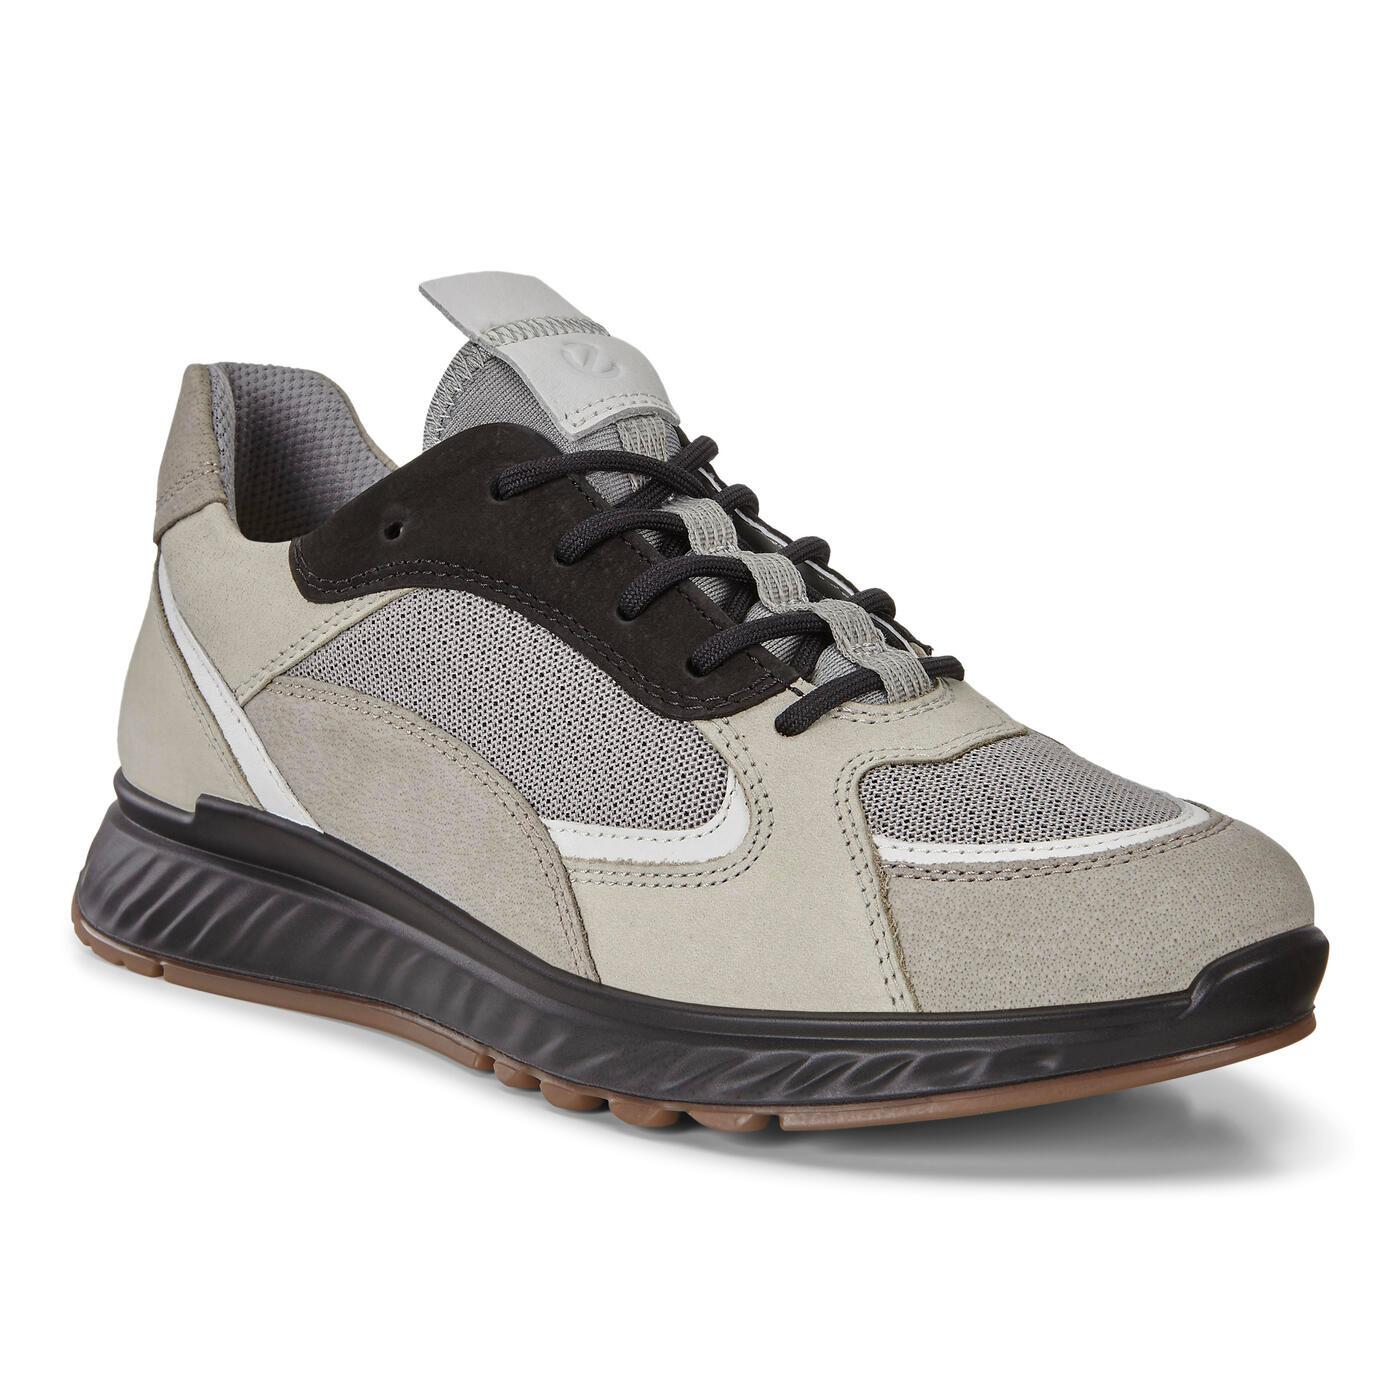 ECCO ST.1 Sneaker | ShoeStores.com